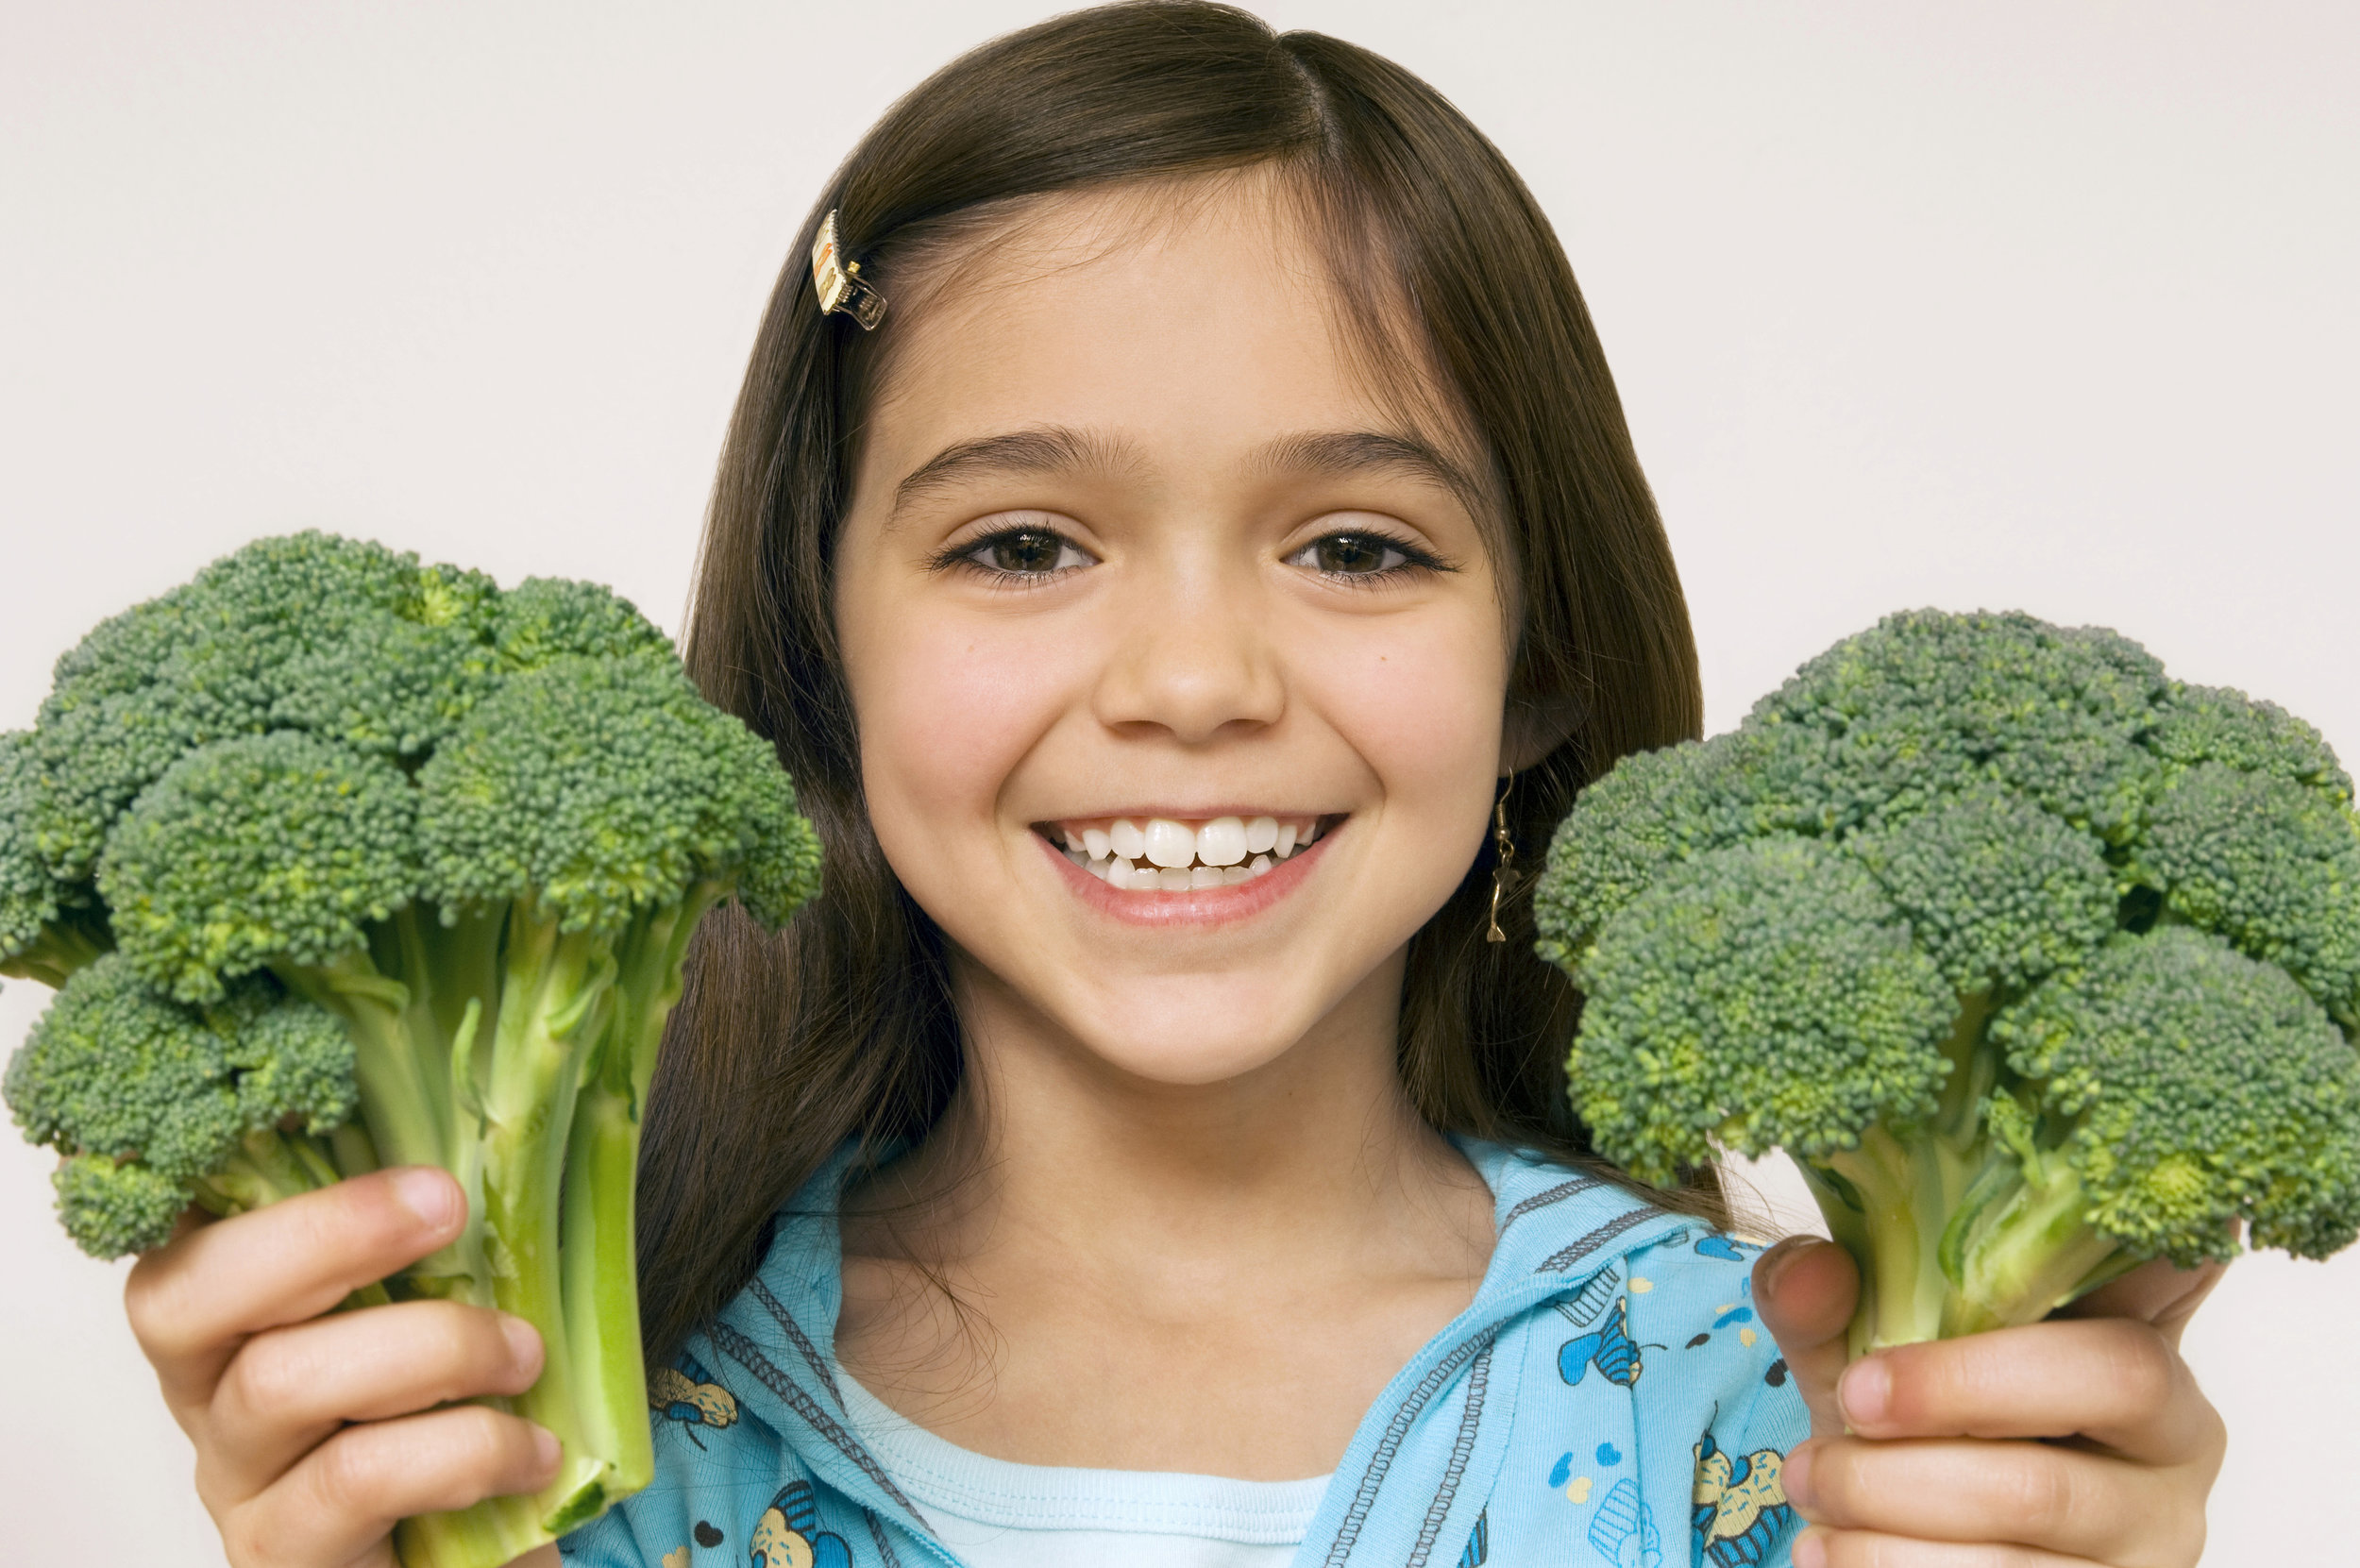 girl holding broccoli.jpg